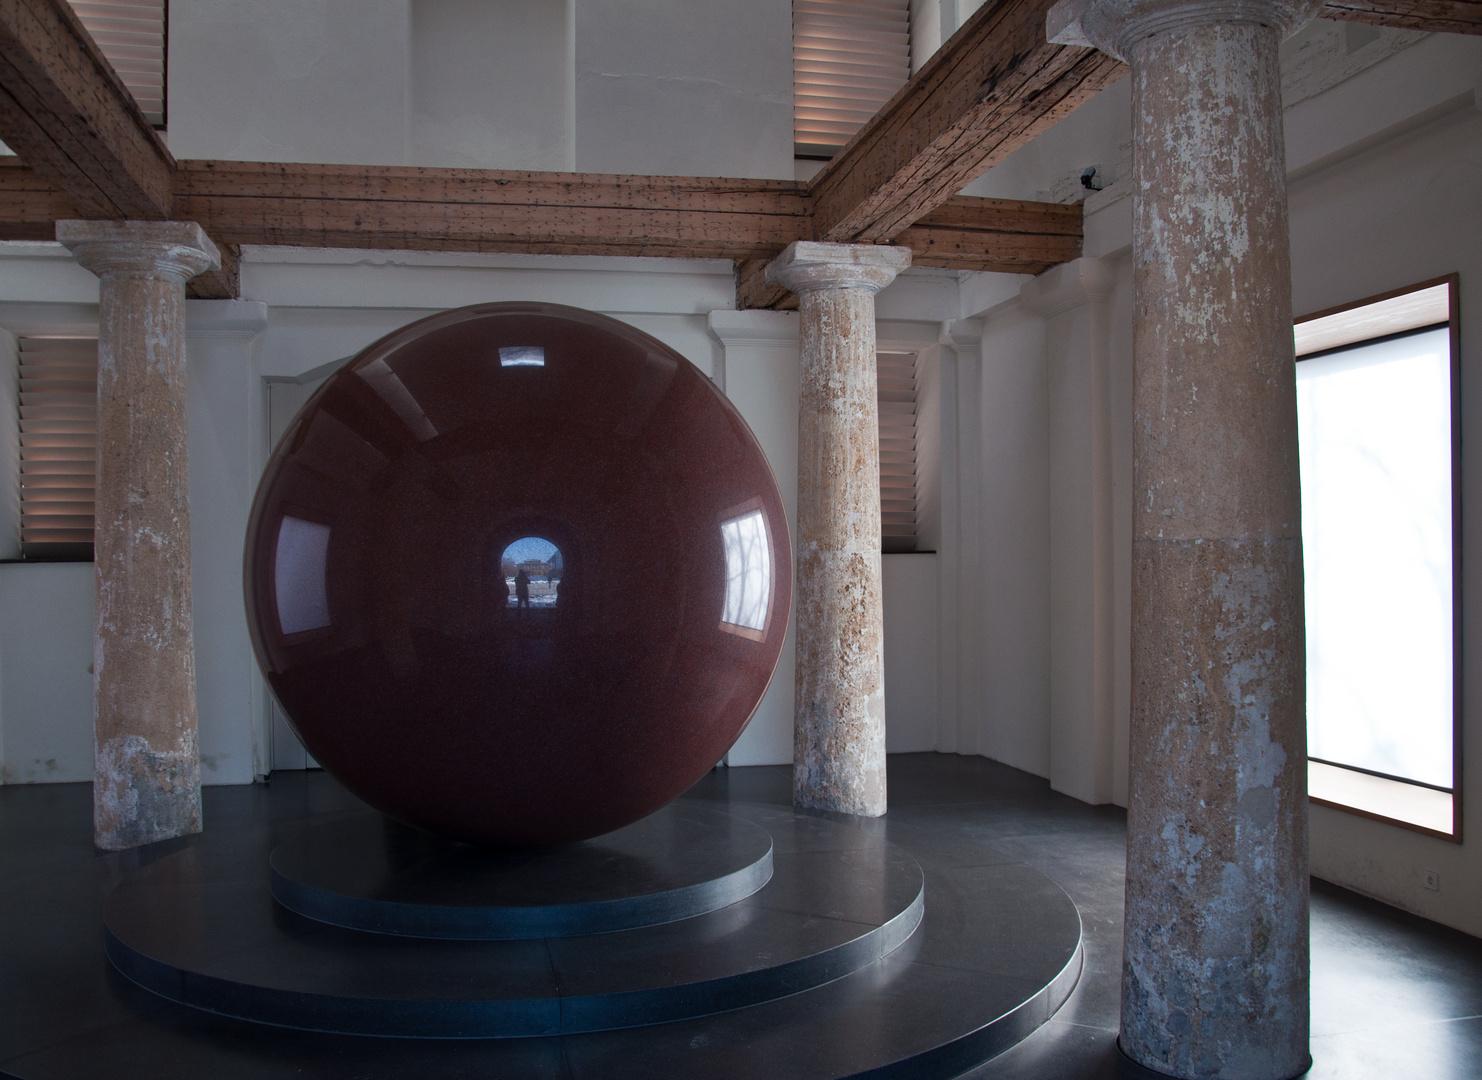 Large Red Sphere im Türkentor